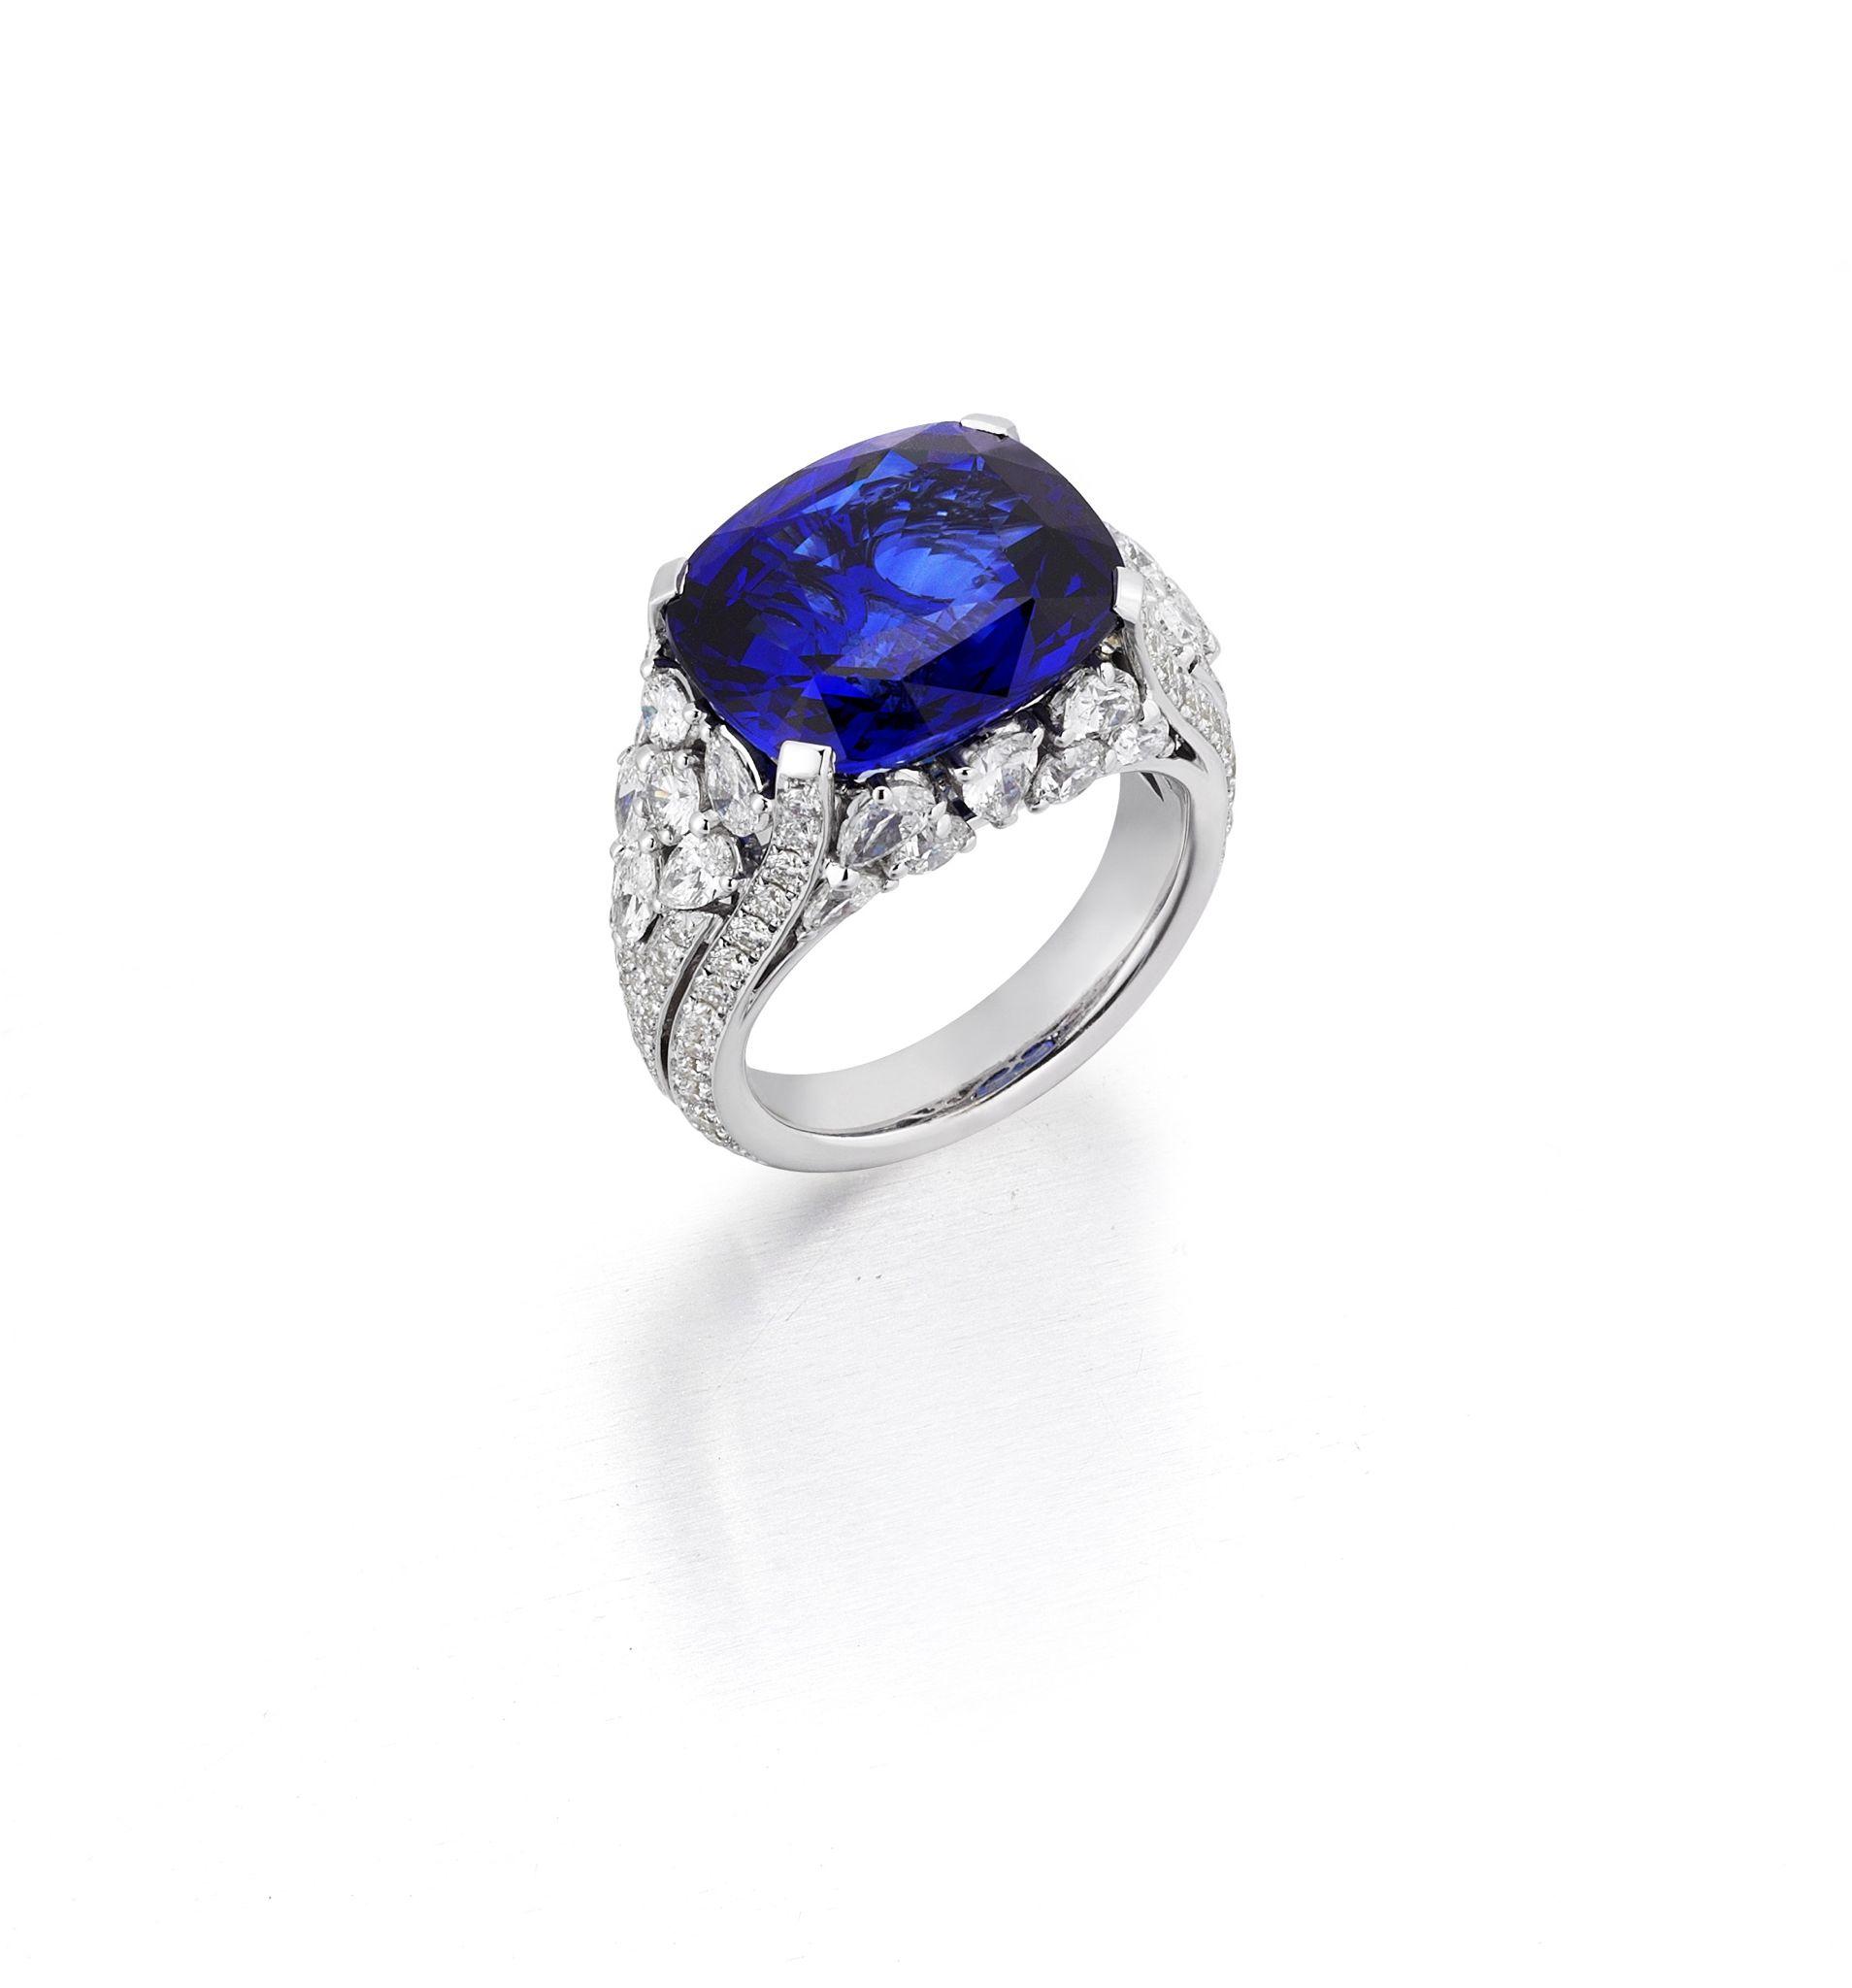 Natural Sri Lanka Sapphire and Diamonds